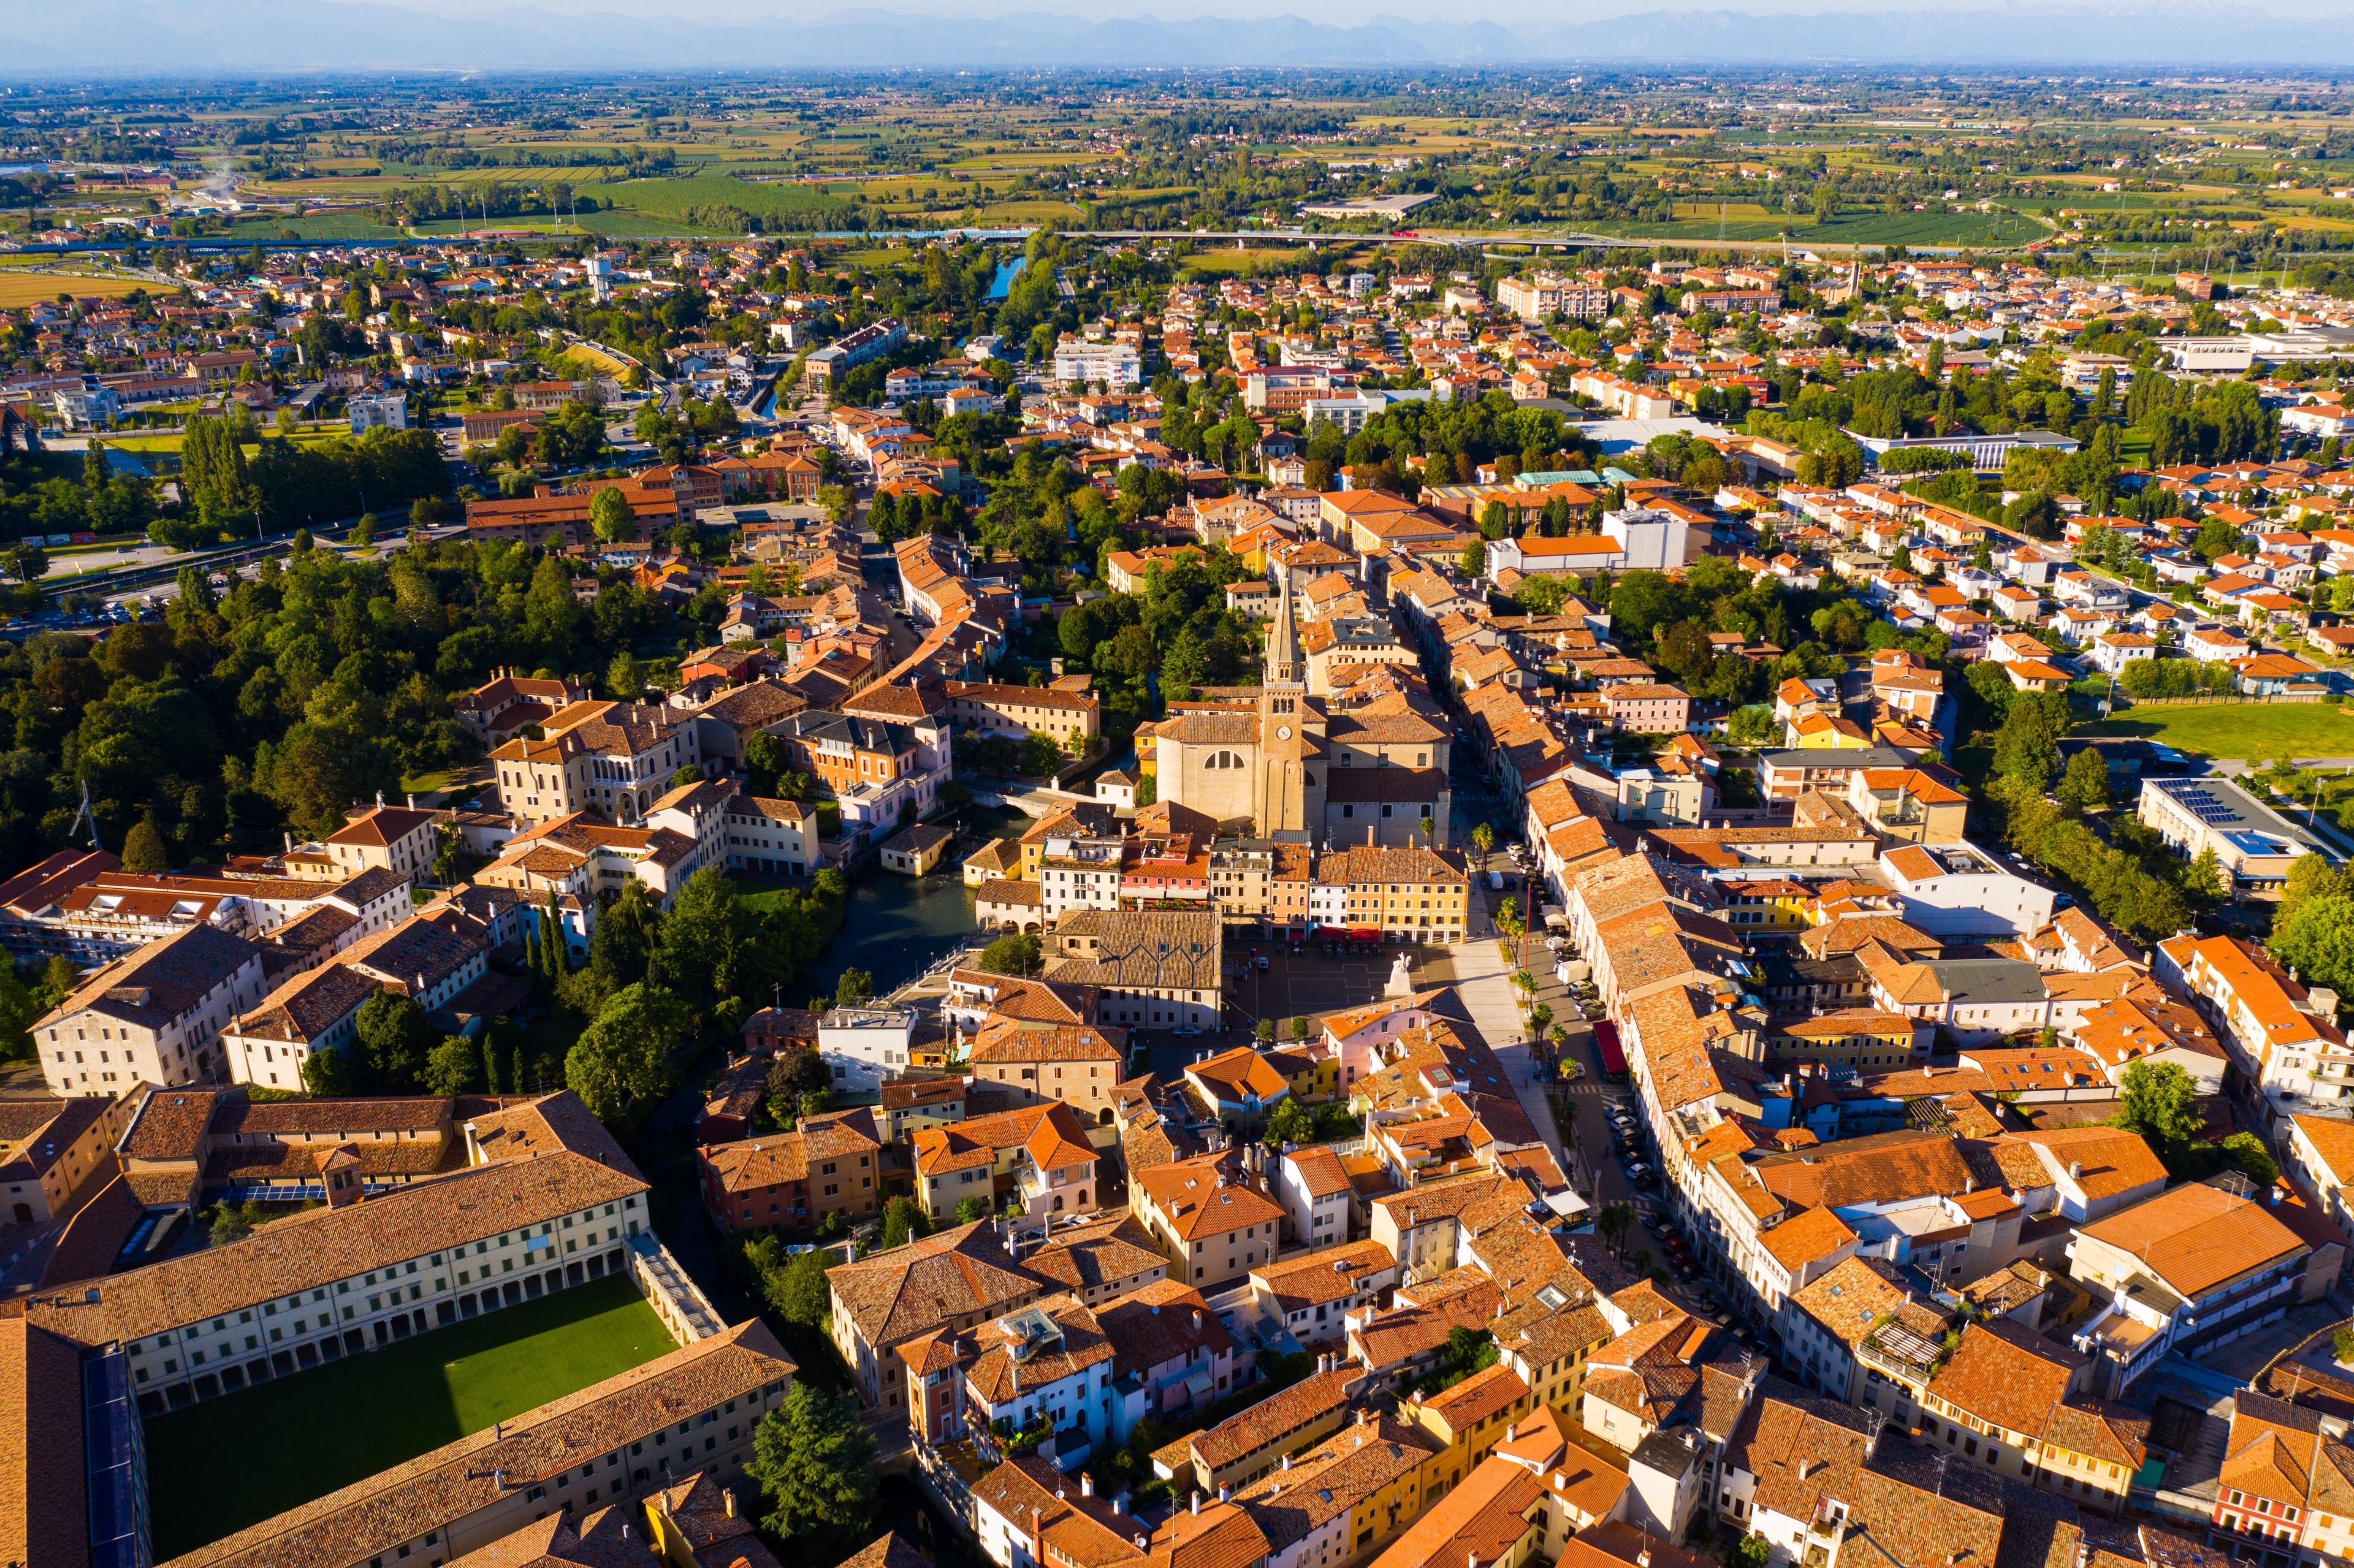 Portogruaro, Veneto, Italy